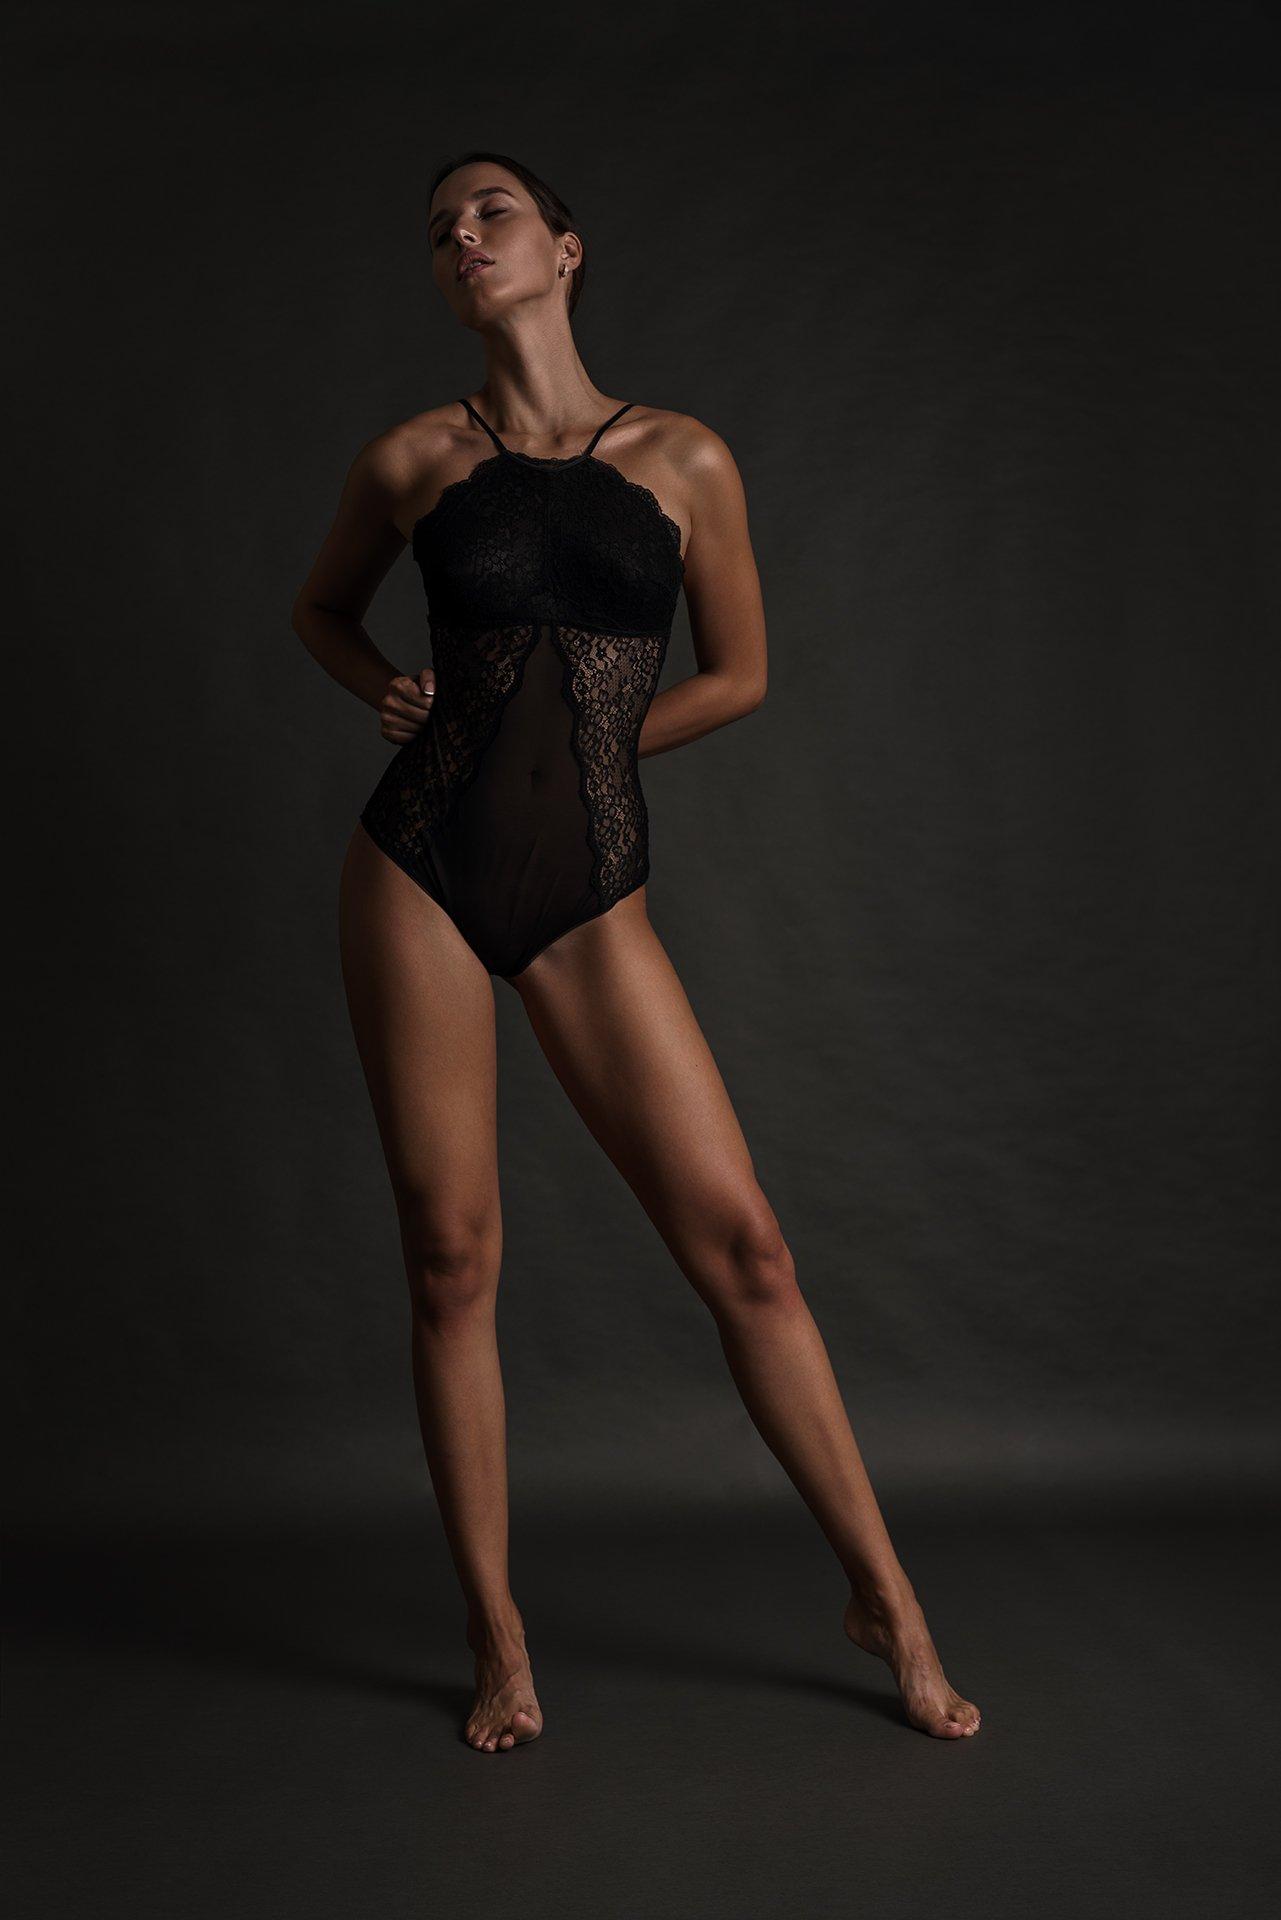 girl, model, test, tests, studio, moscow, profoto, sony, beauty, nice, Роман Филиппов